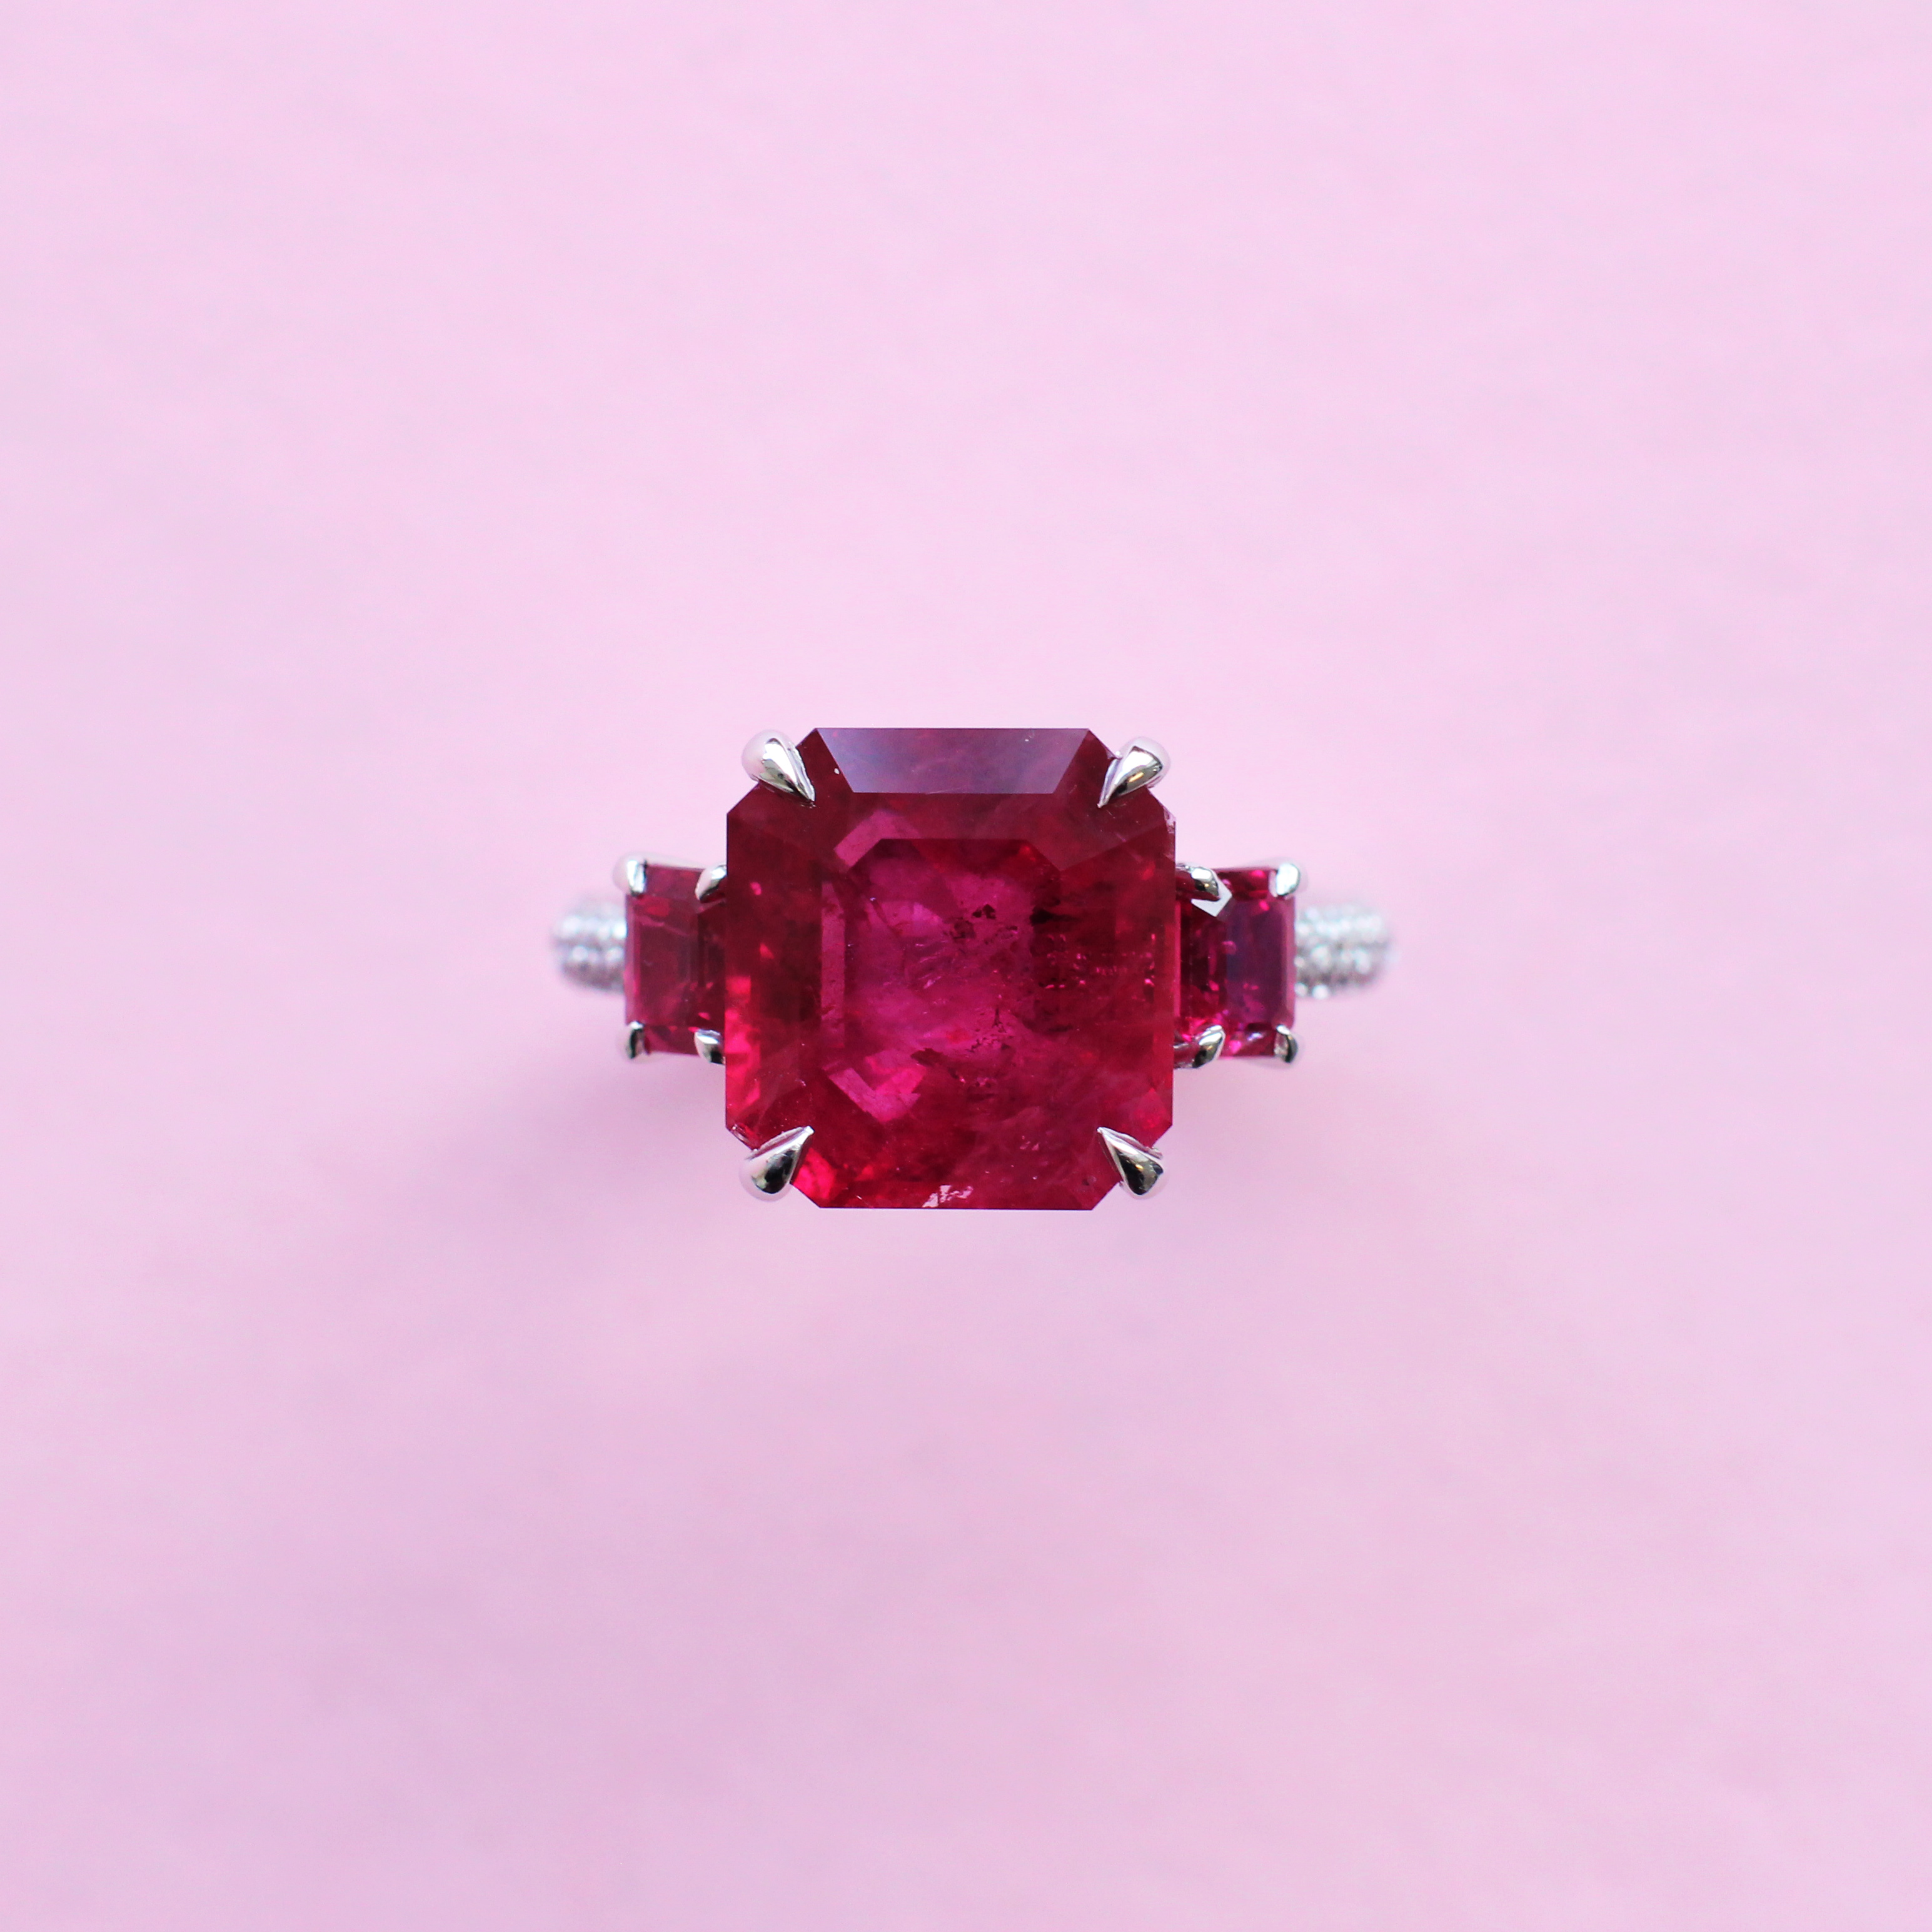 monochrome ruby, diamond and platinum ring